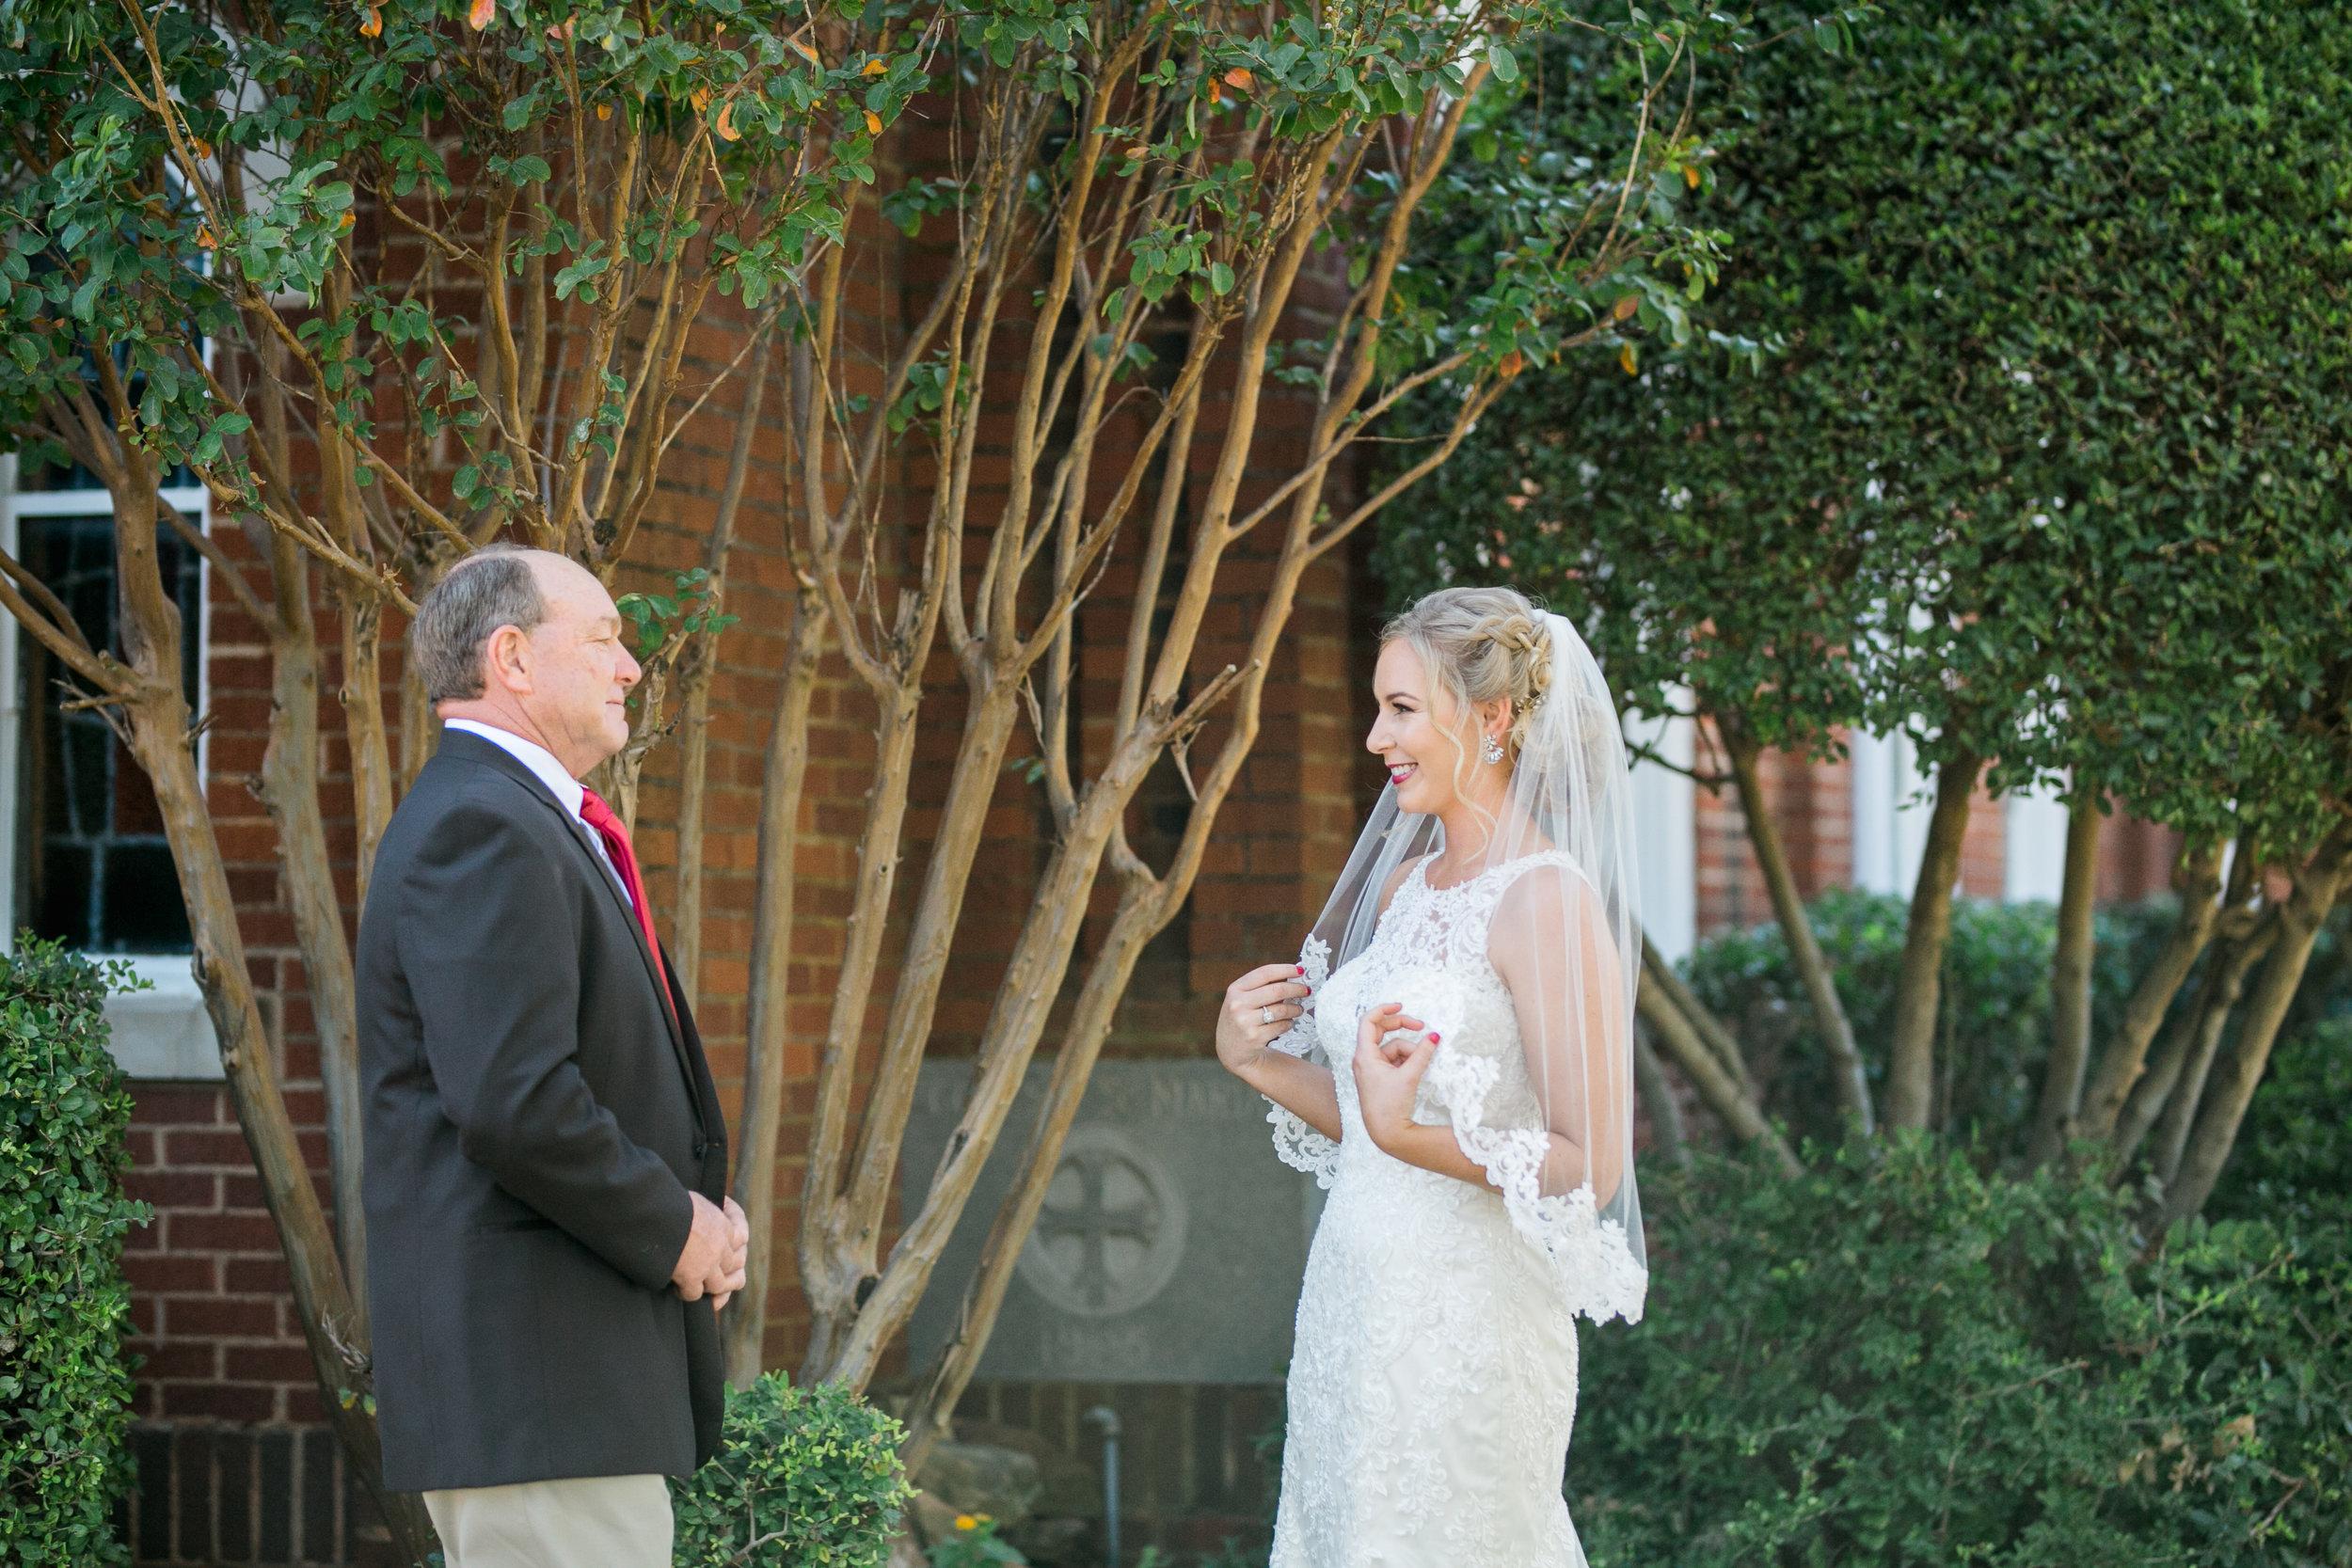 Bailey-Nathan-Windthorst-Texas-Wedding-018.jpg